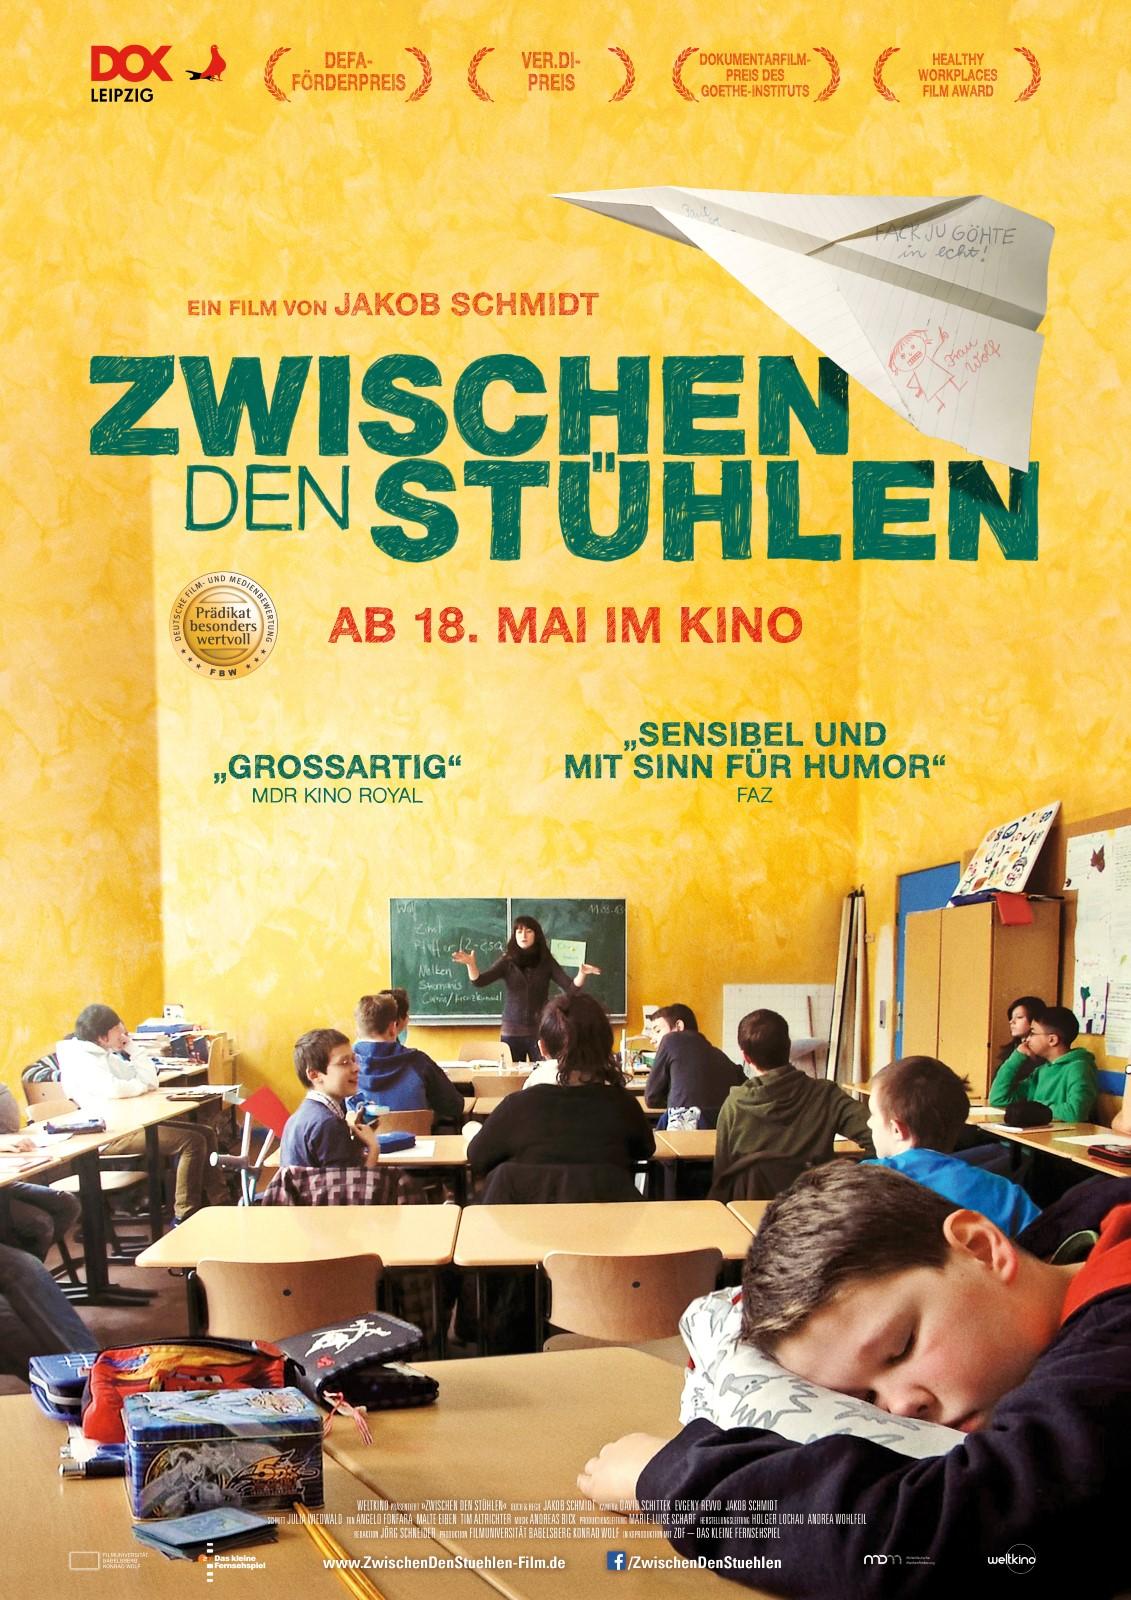 parkplatzsex augsburg kinoprogramm kissingen